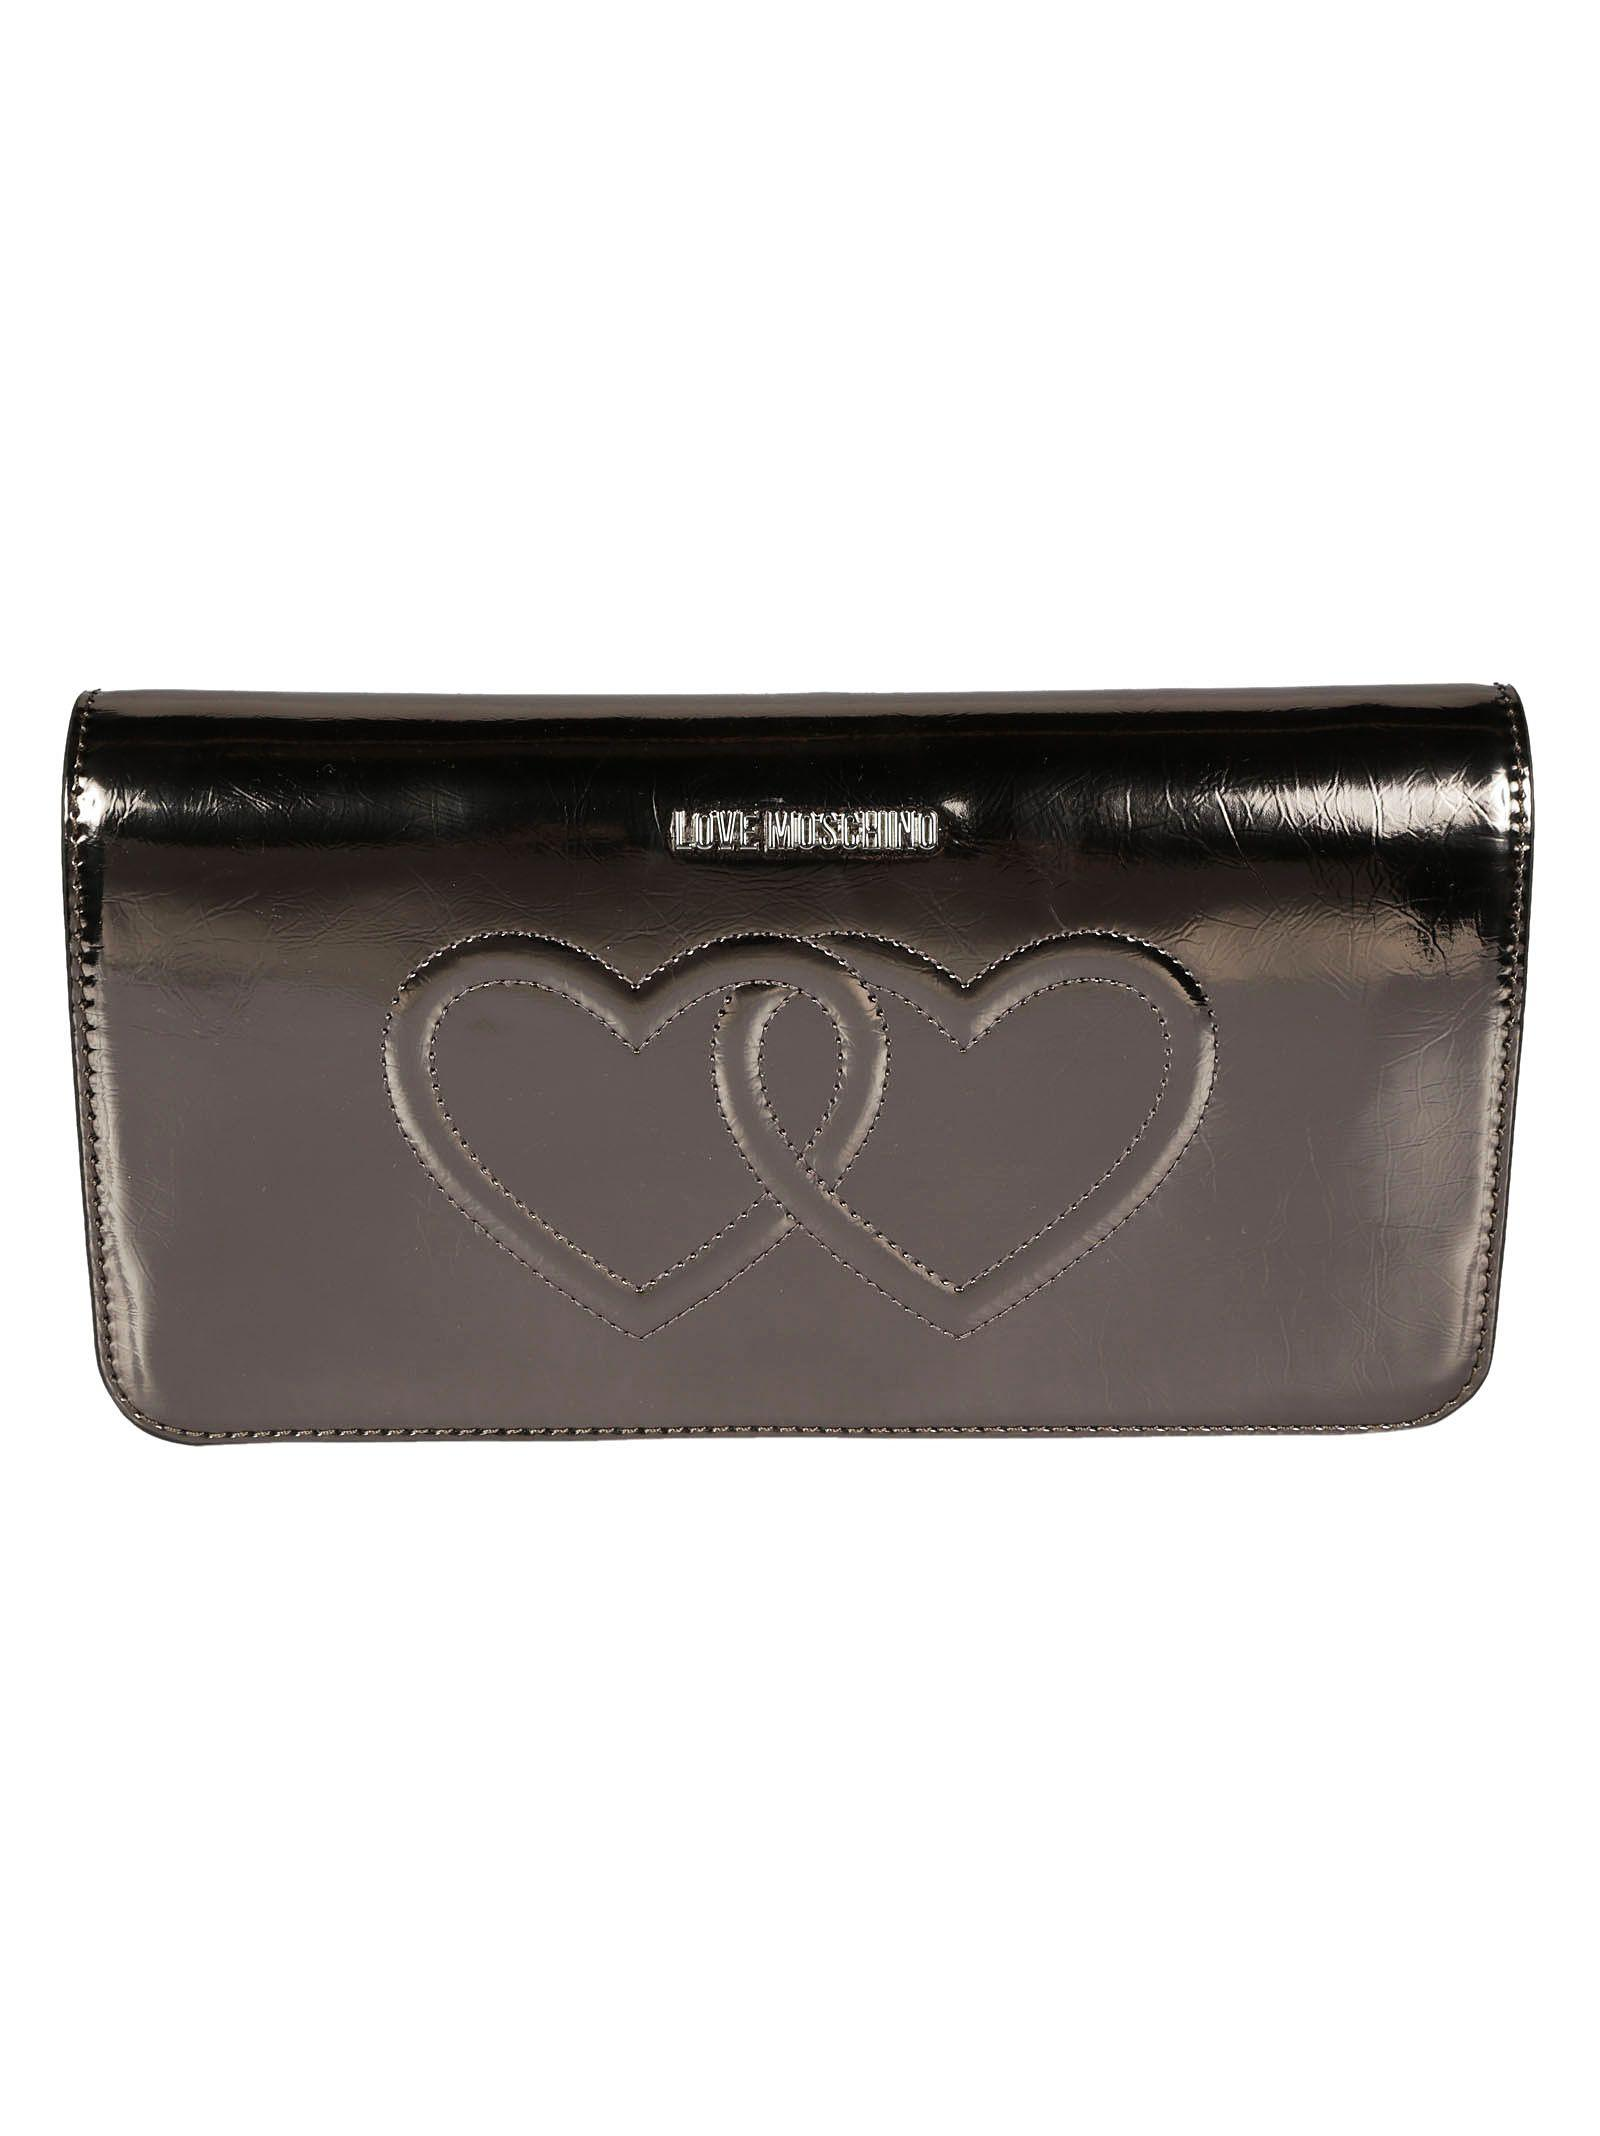 Love Moschino Interlocked Hearts Shoulder Bag In Silver